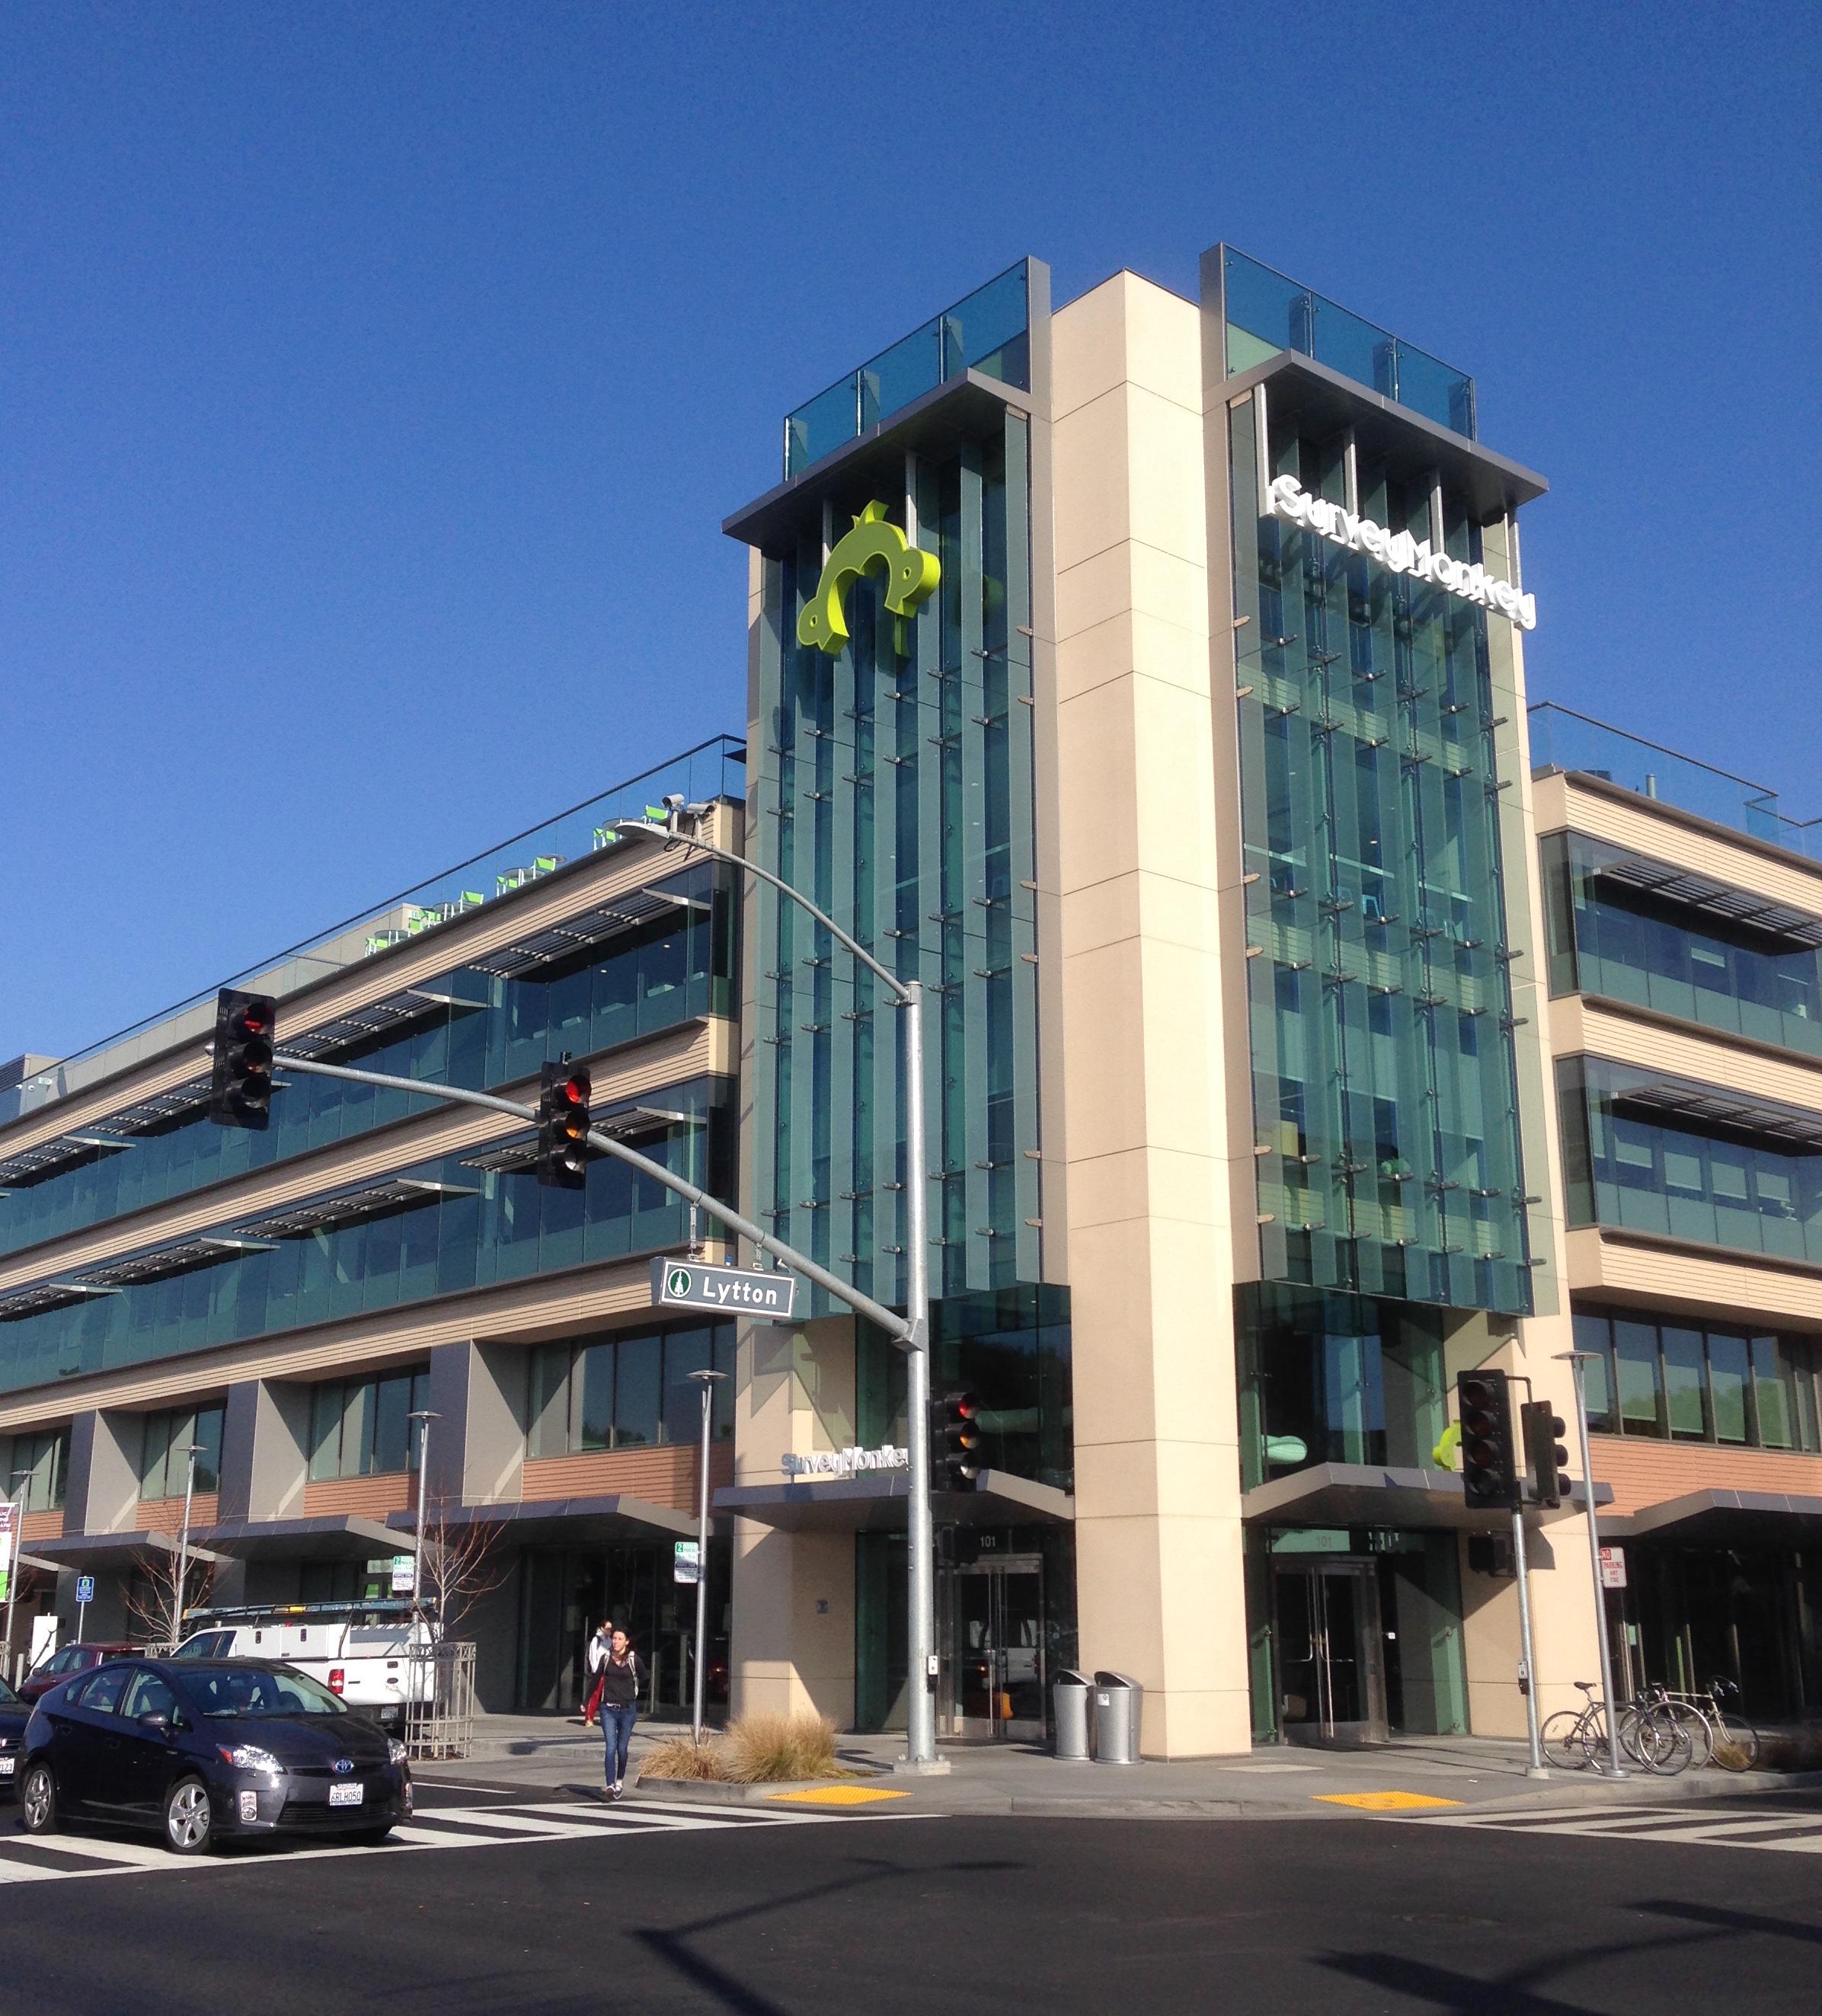 The SurveyMonkey office in Palo Alto, California.